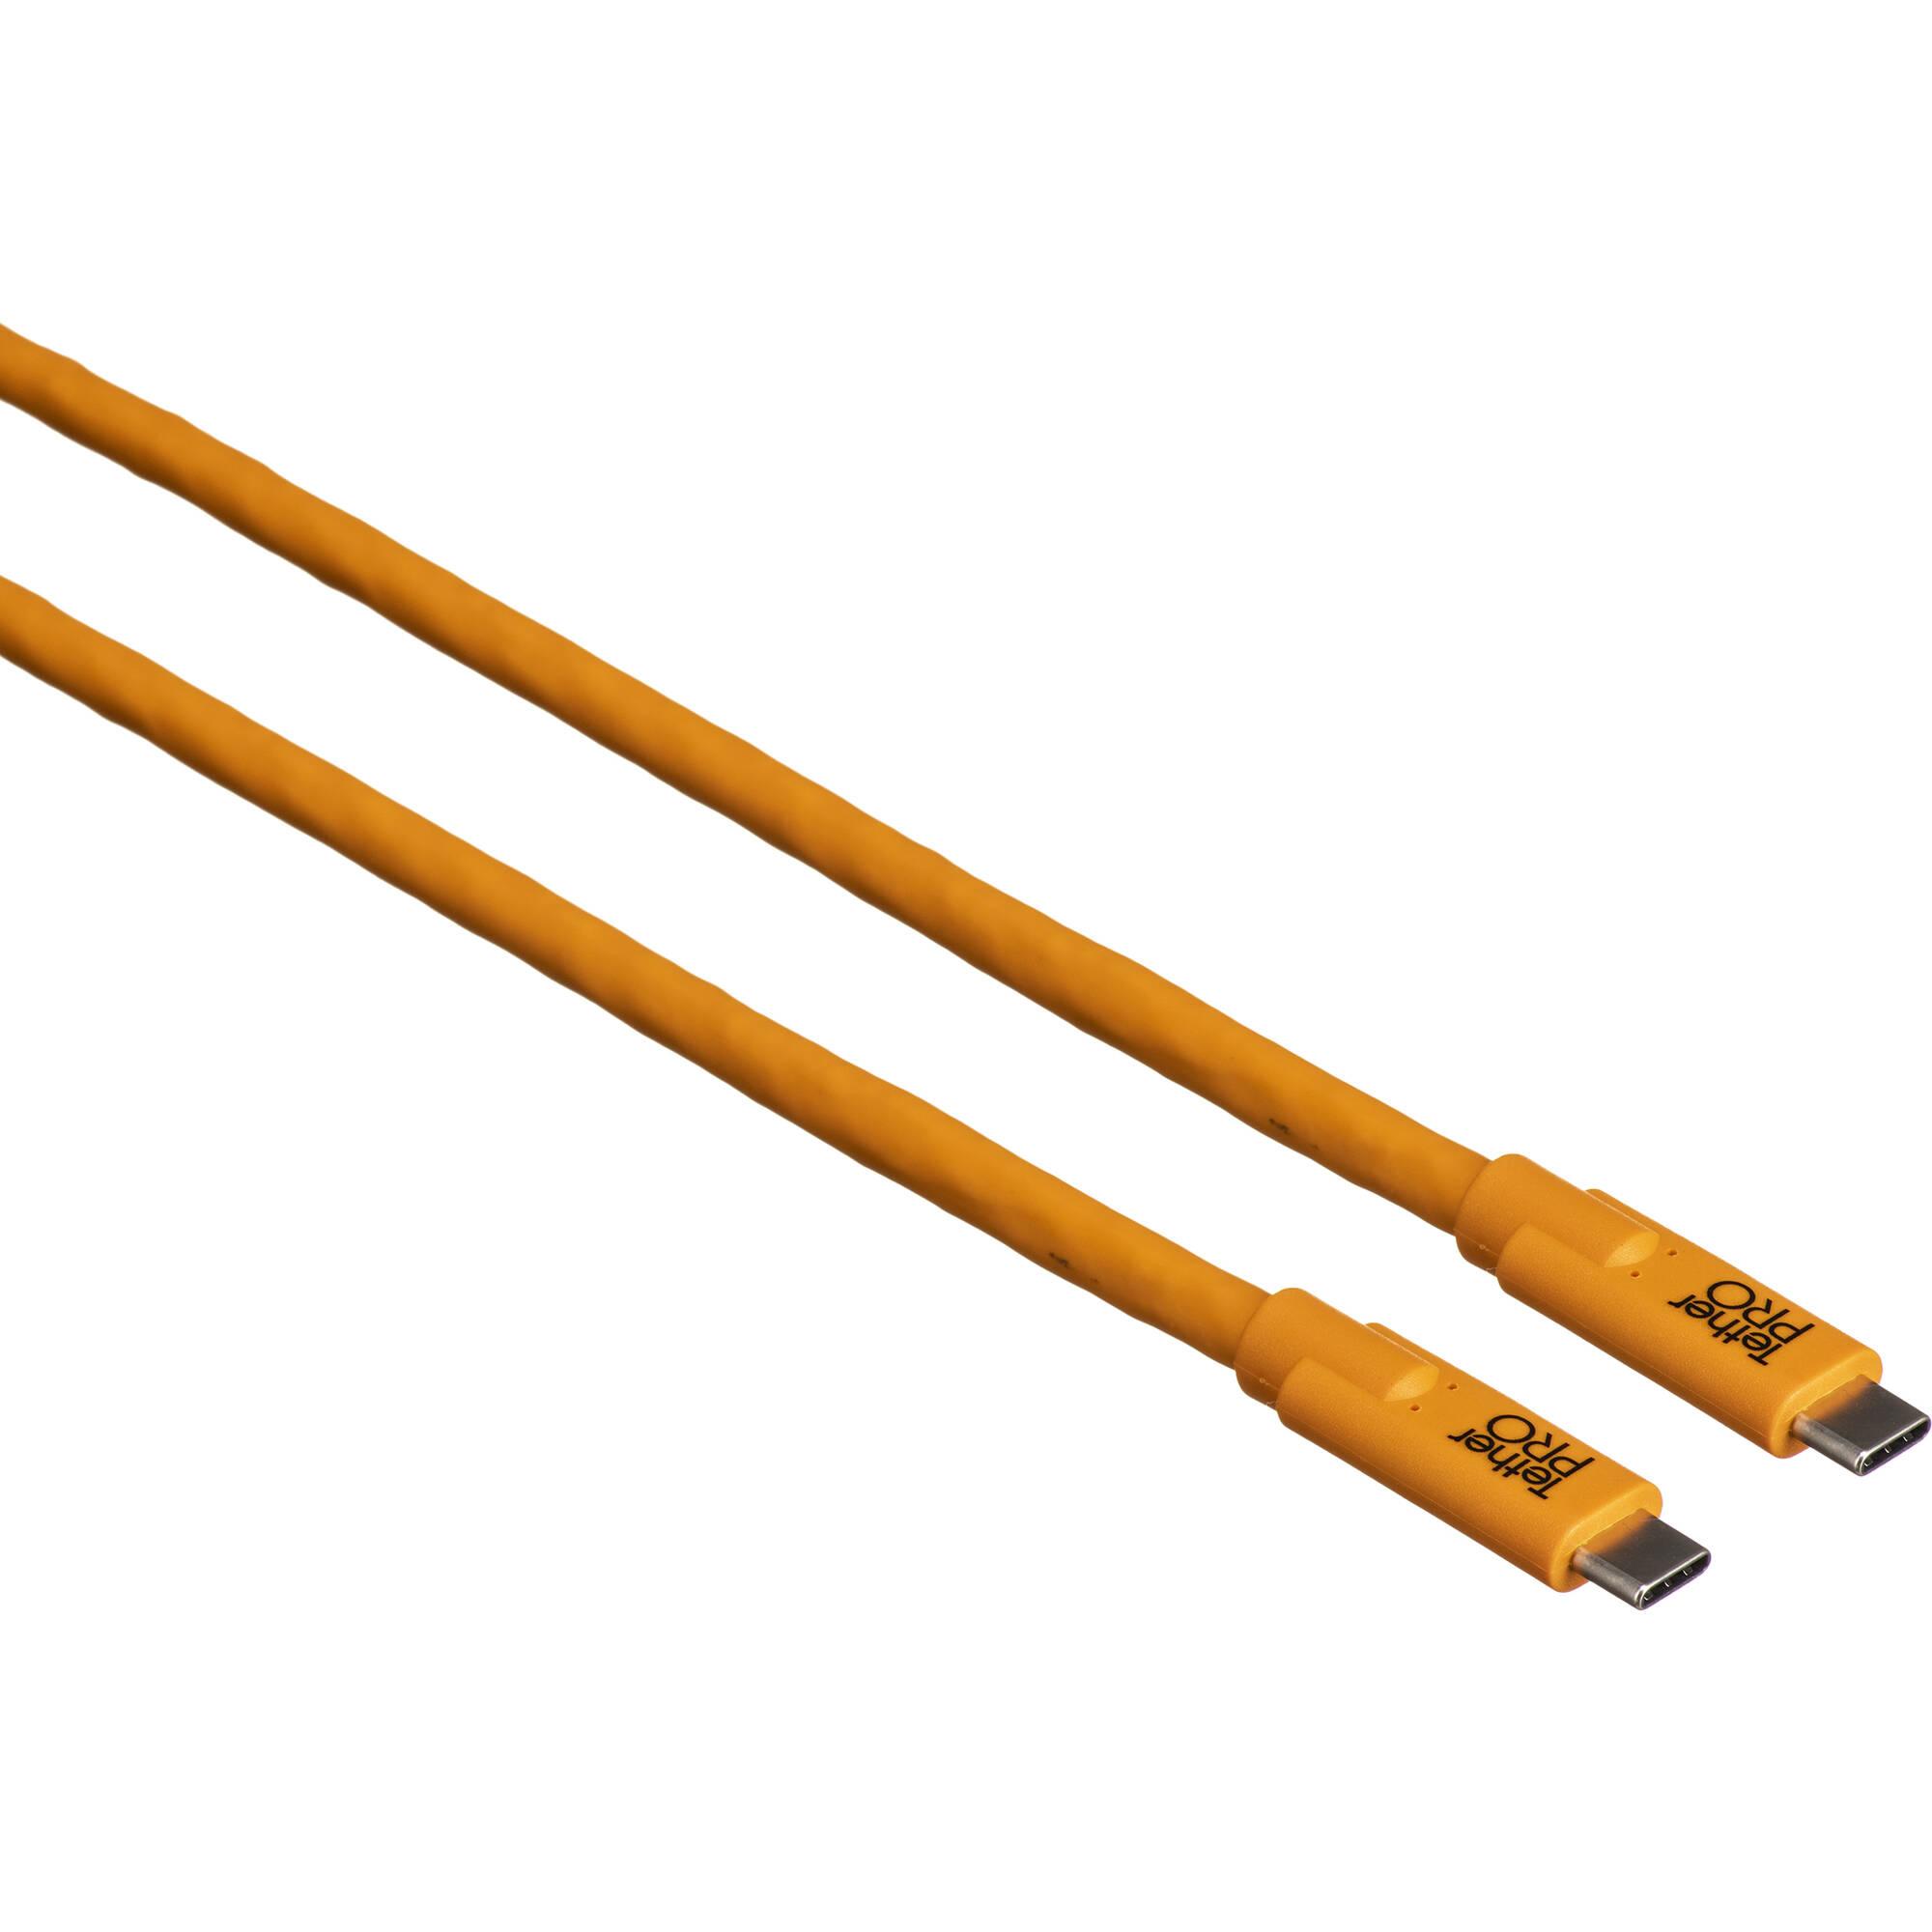 garmin gps usb cable type